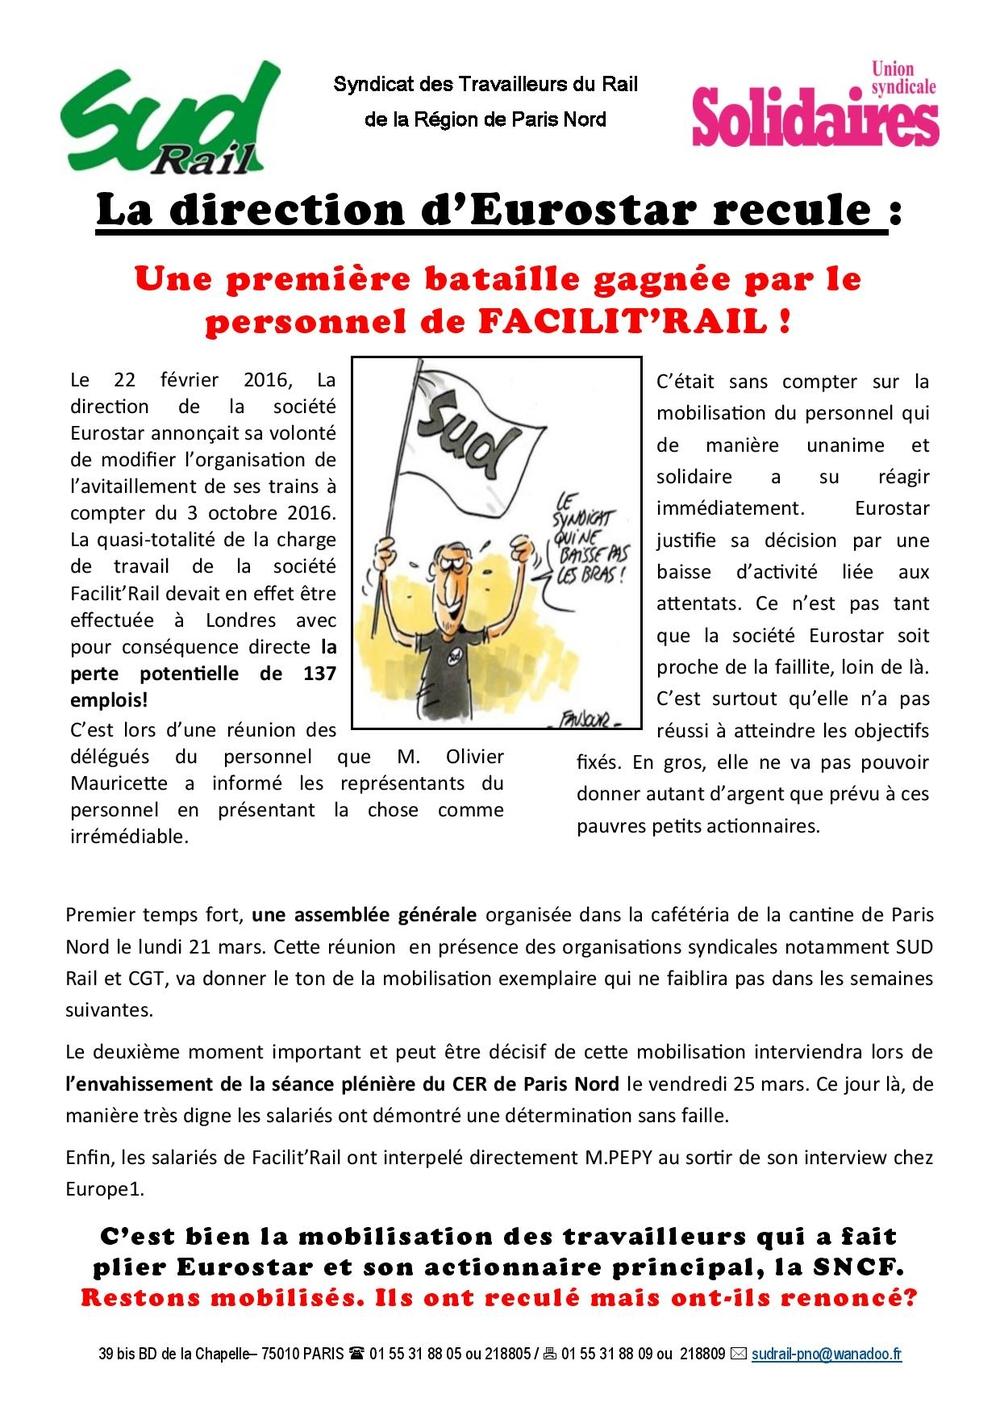 Facilit-rail 04-2016